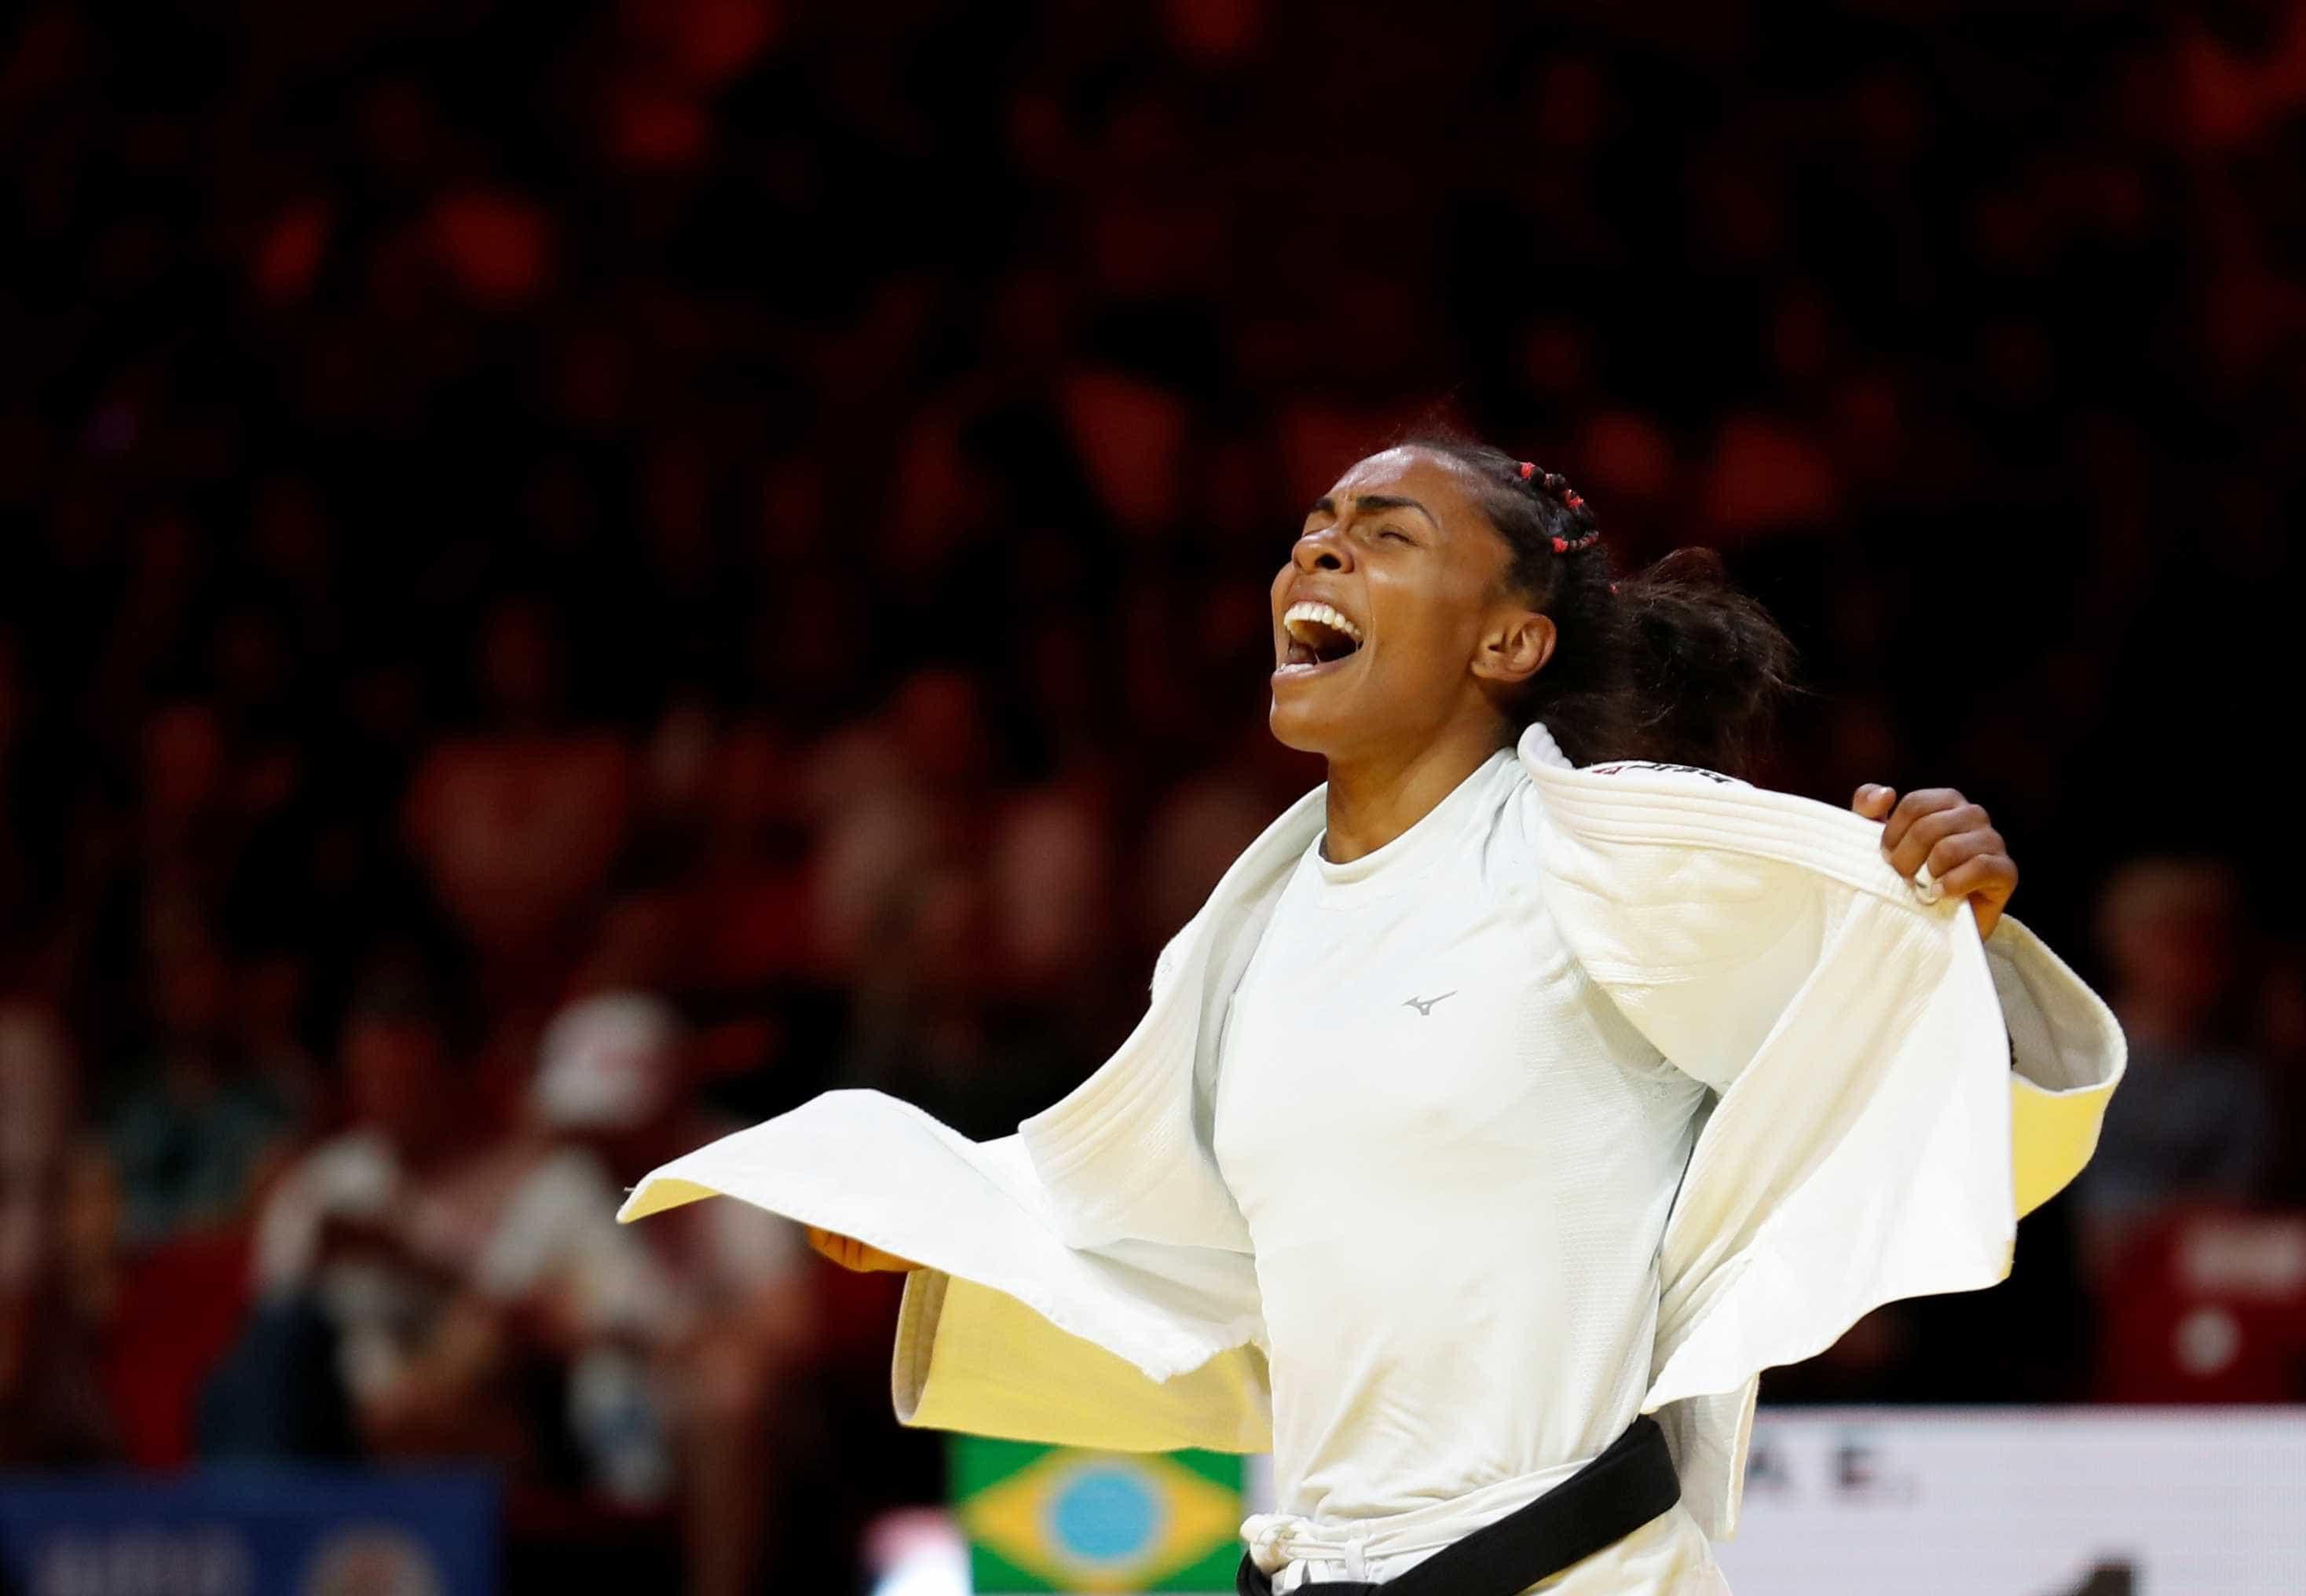 Medalhista nos últimos 5 mundiais, judoca Érika Miranda se aposenta